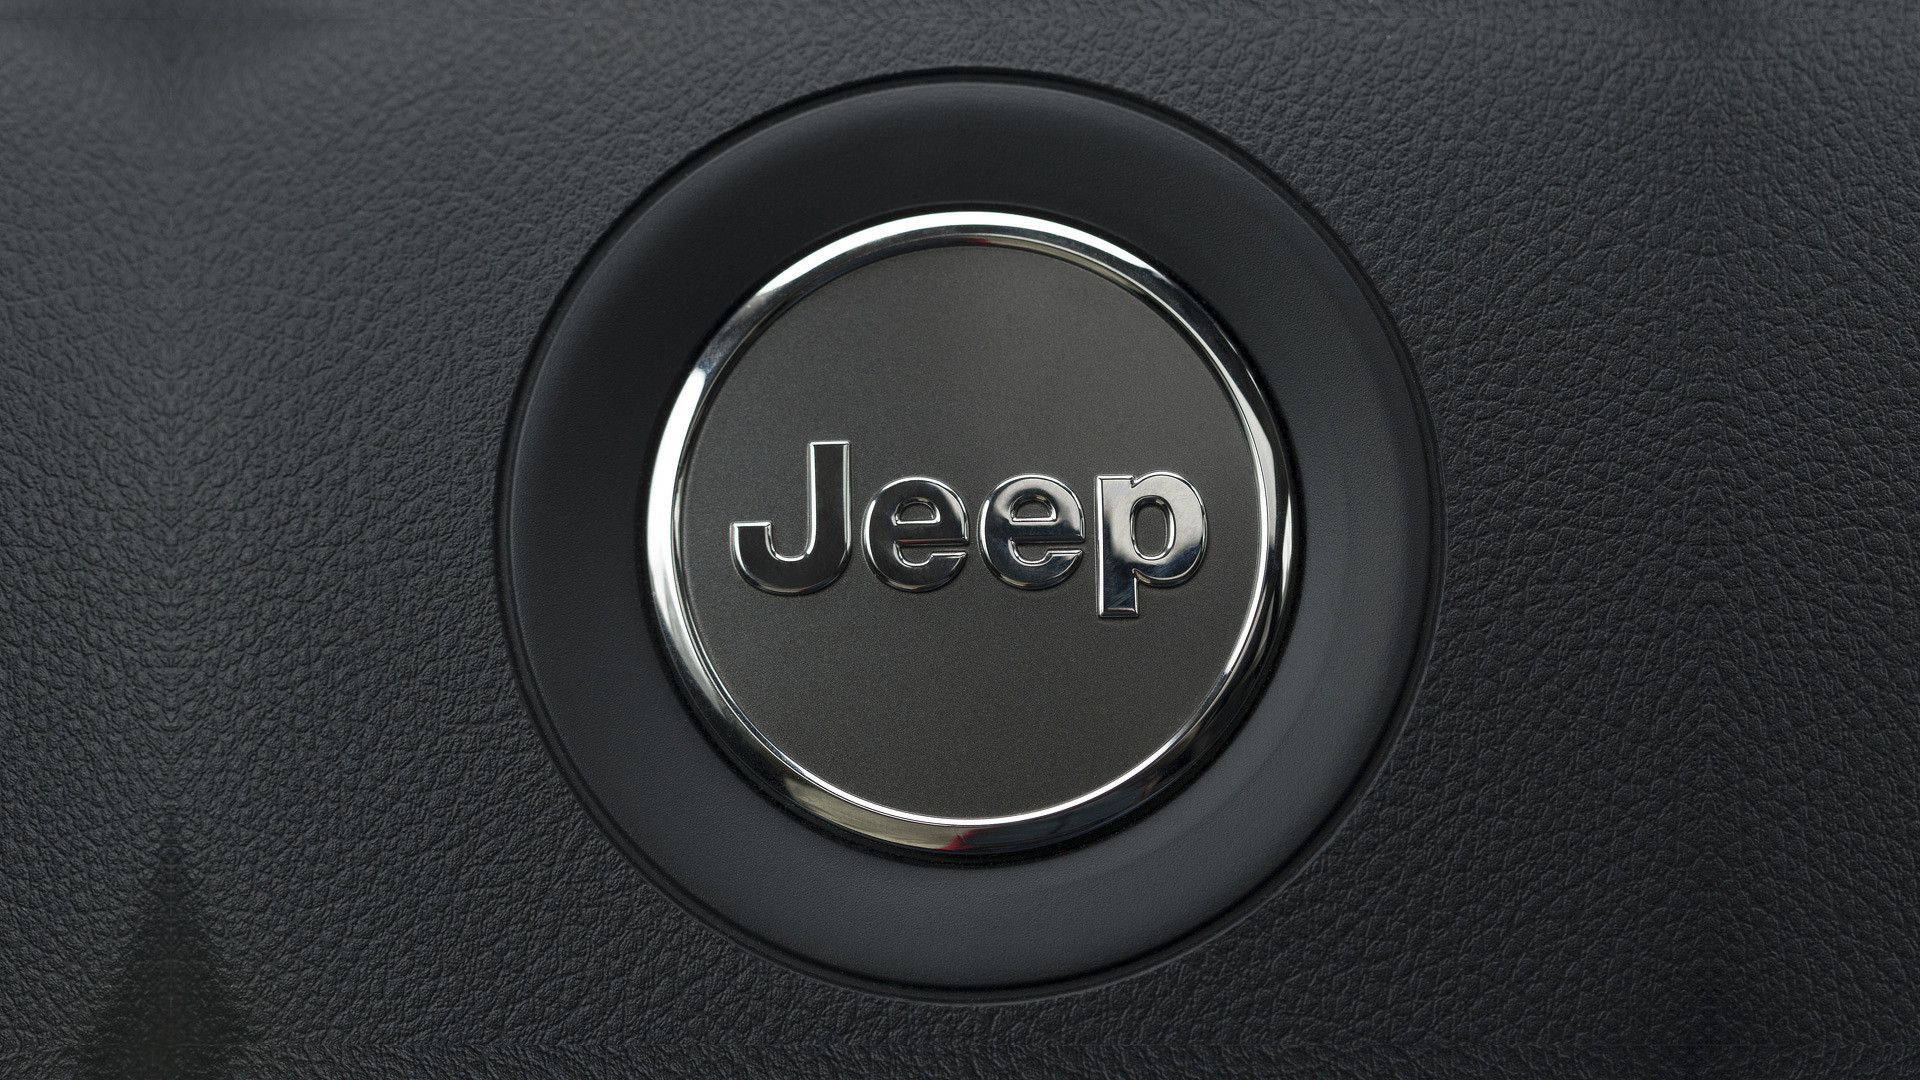 Audi Car Logo Wallpapers Jeep Logo Wallpaper 61 Images